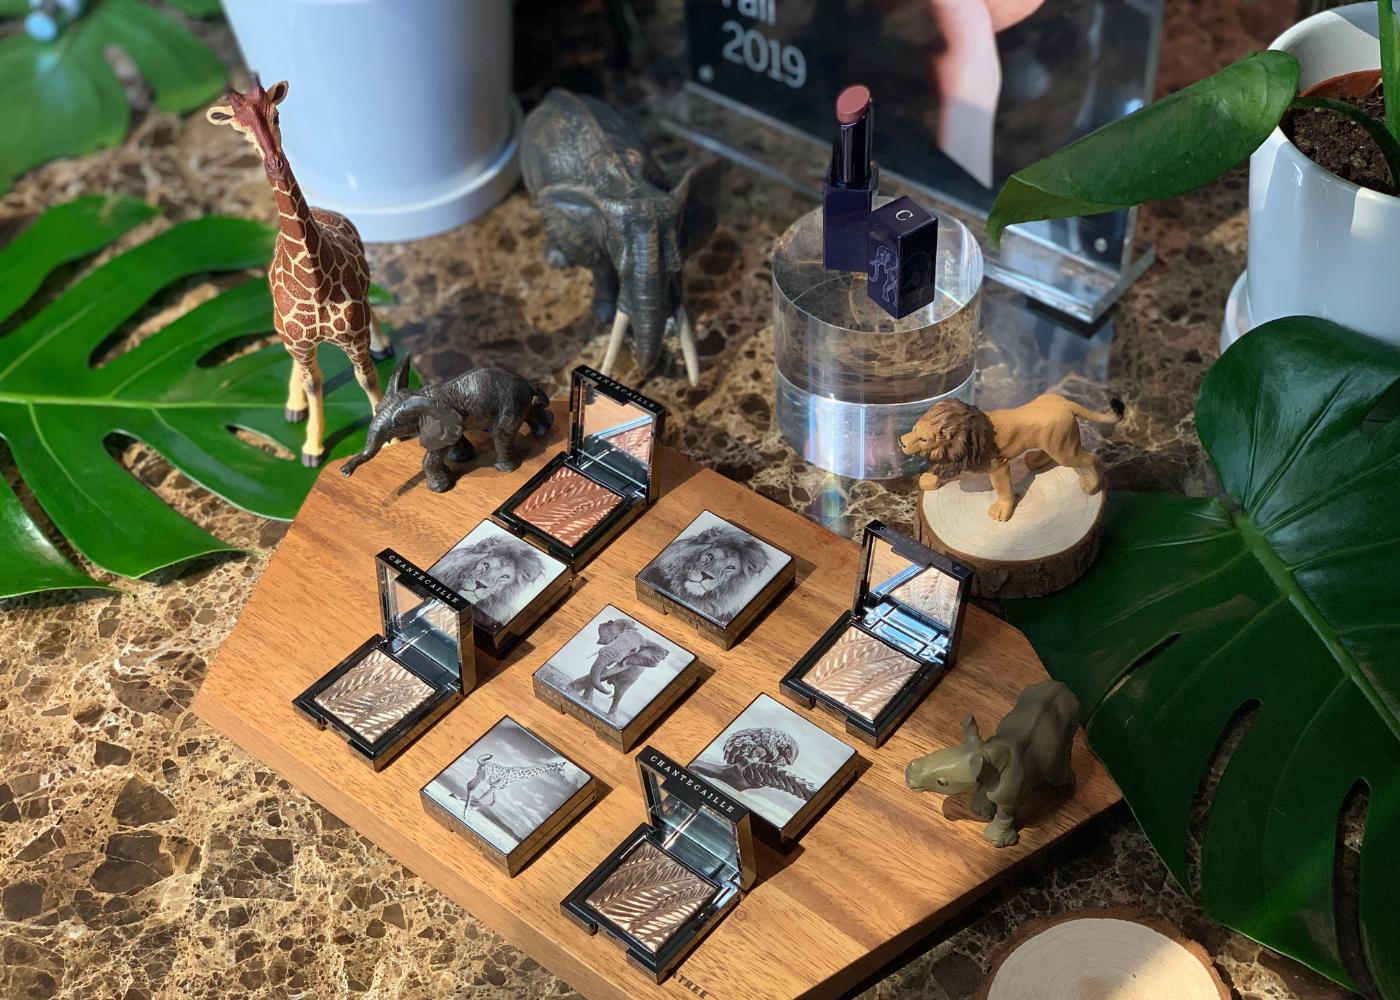 Chantecaille's Fall 2019 collection is giving us major Safari goals